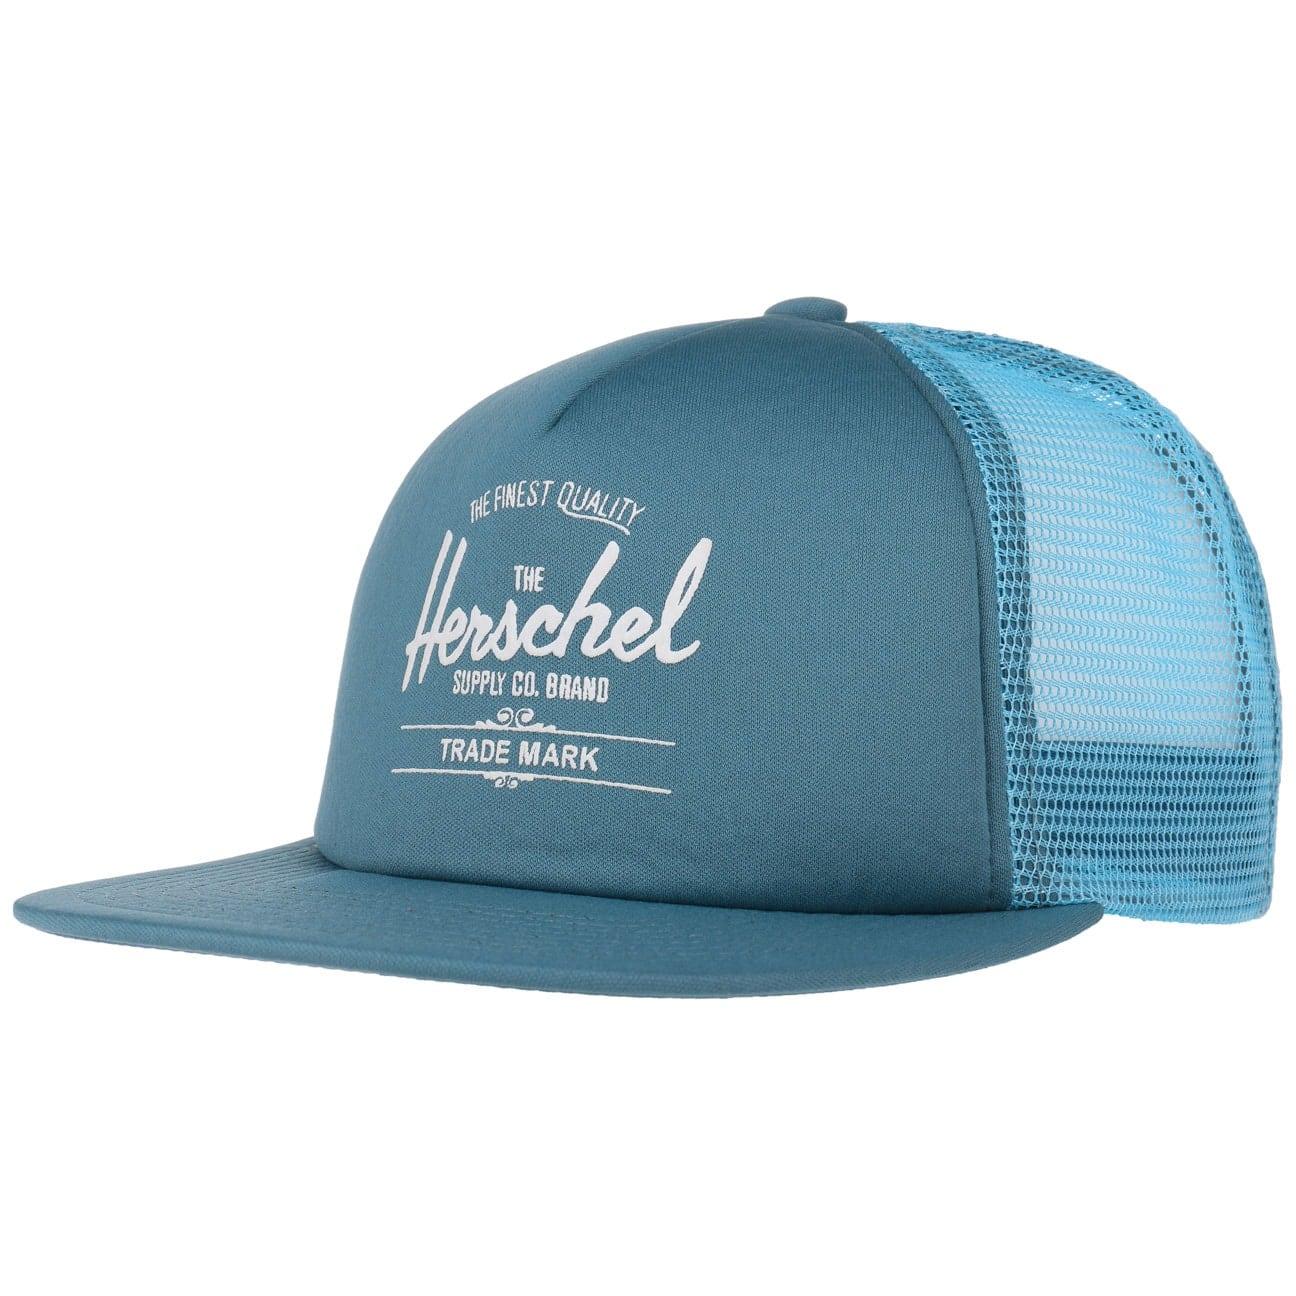 Casquette Whaler Mesh Flatbrim by Herschel  casquette hip hop